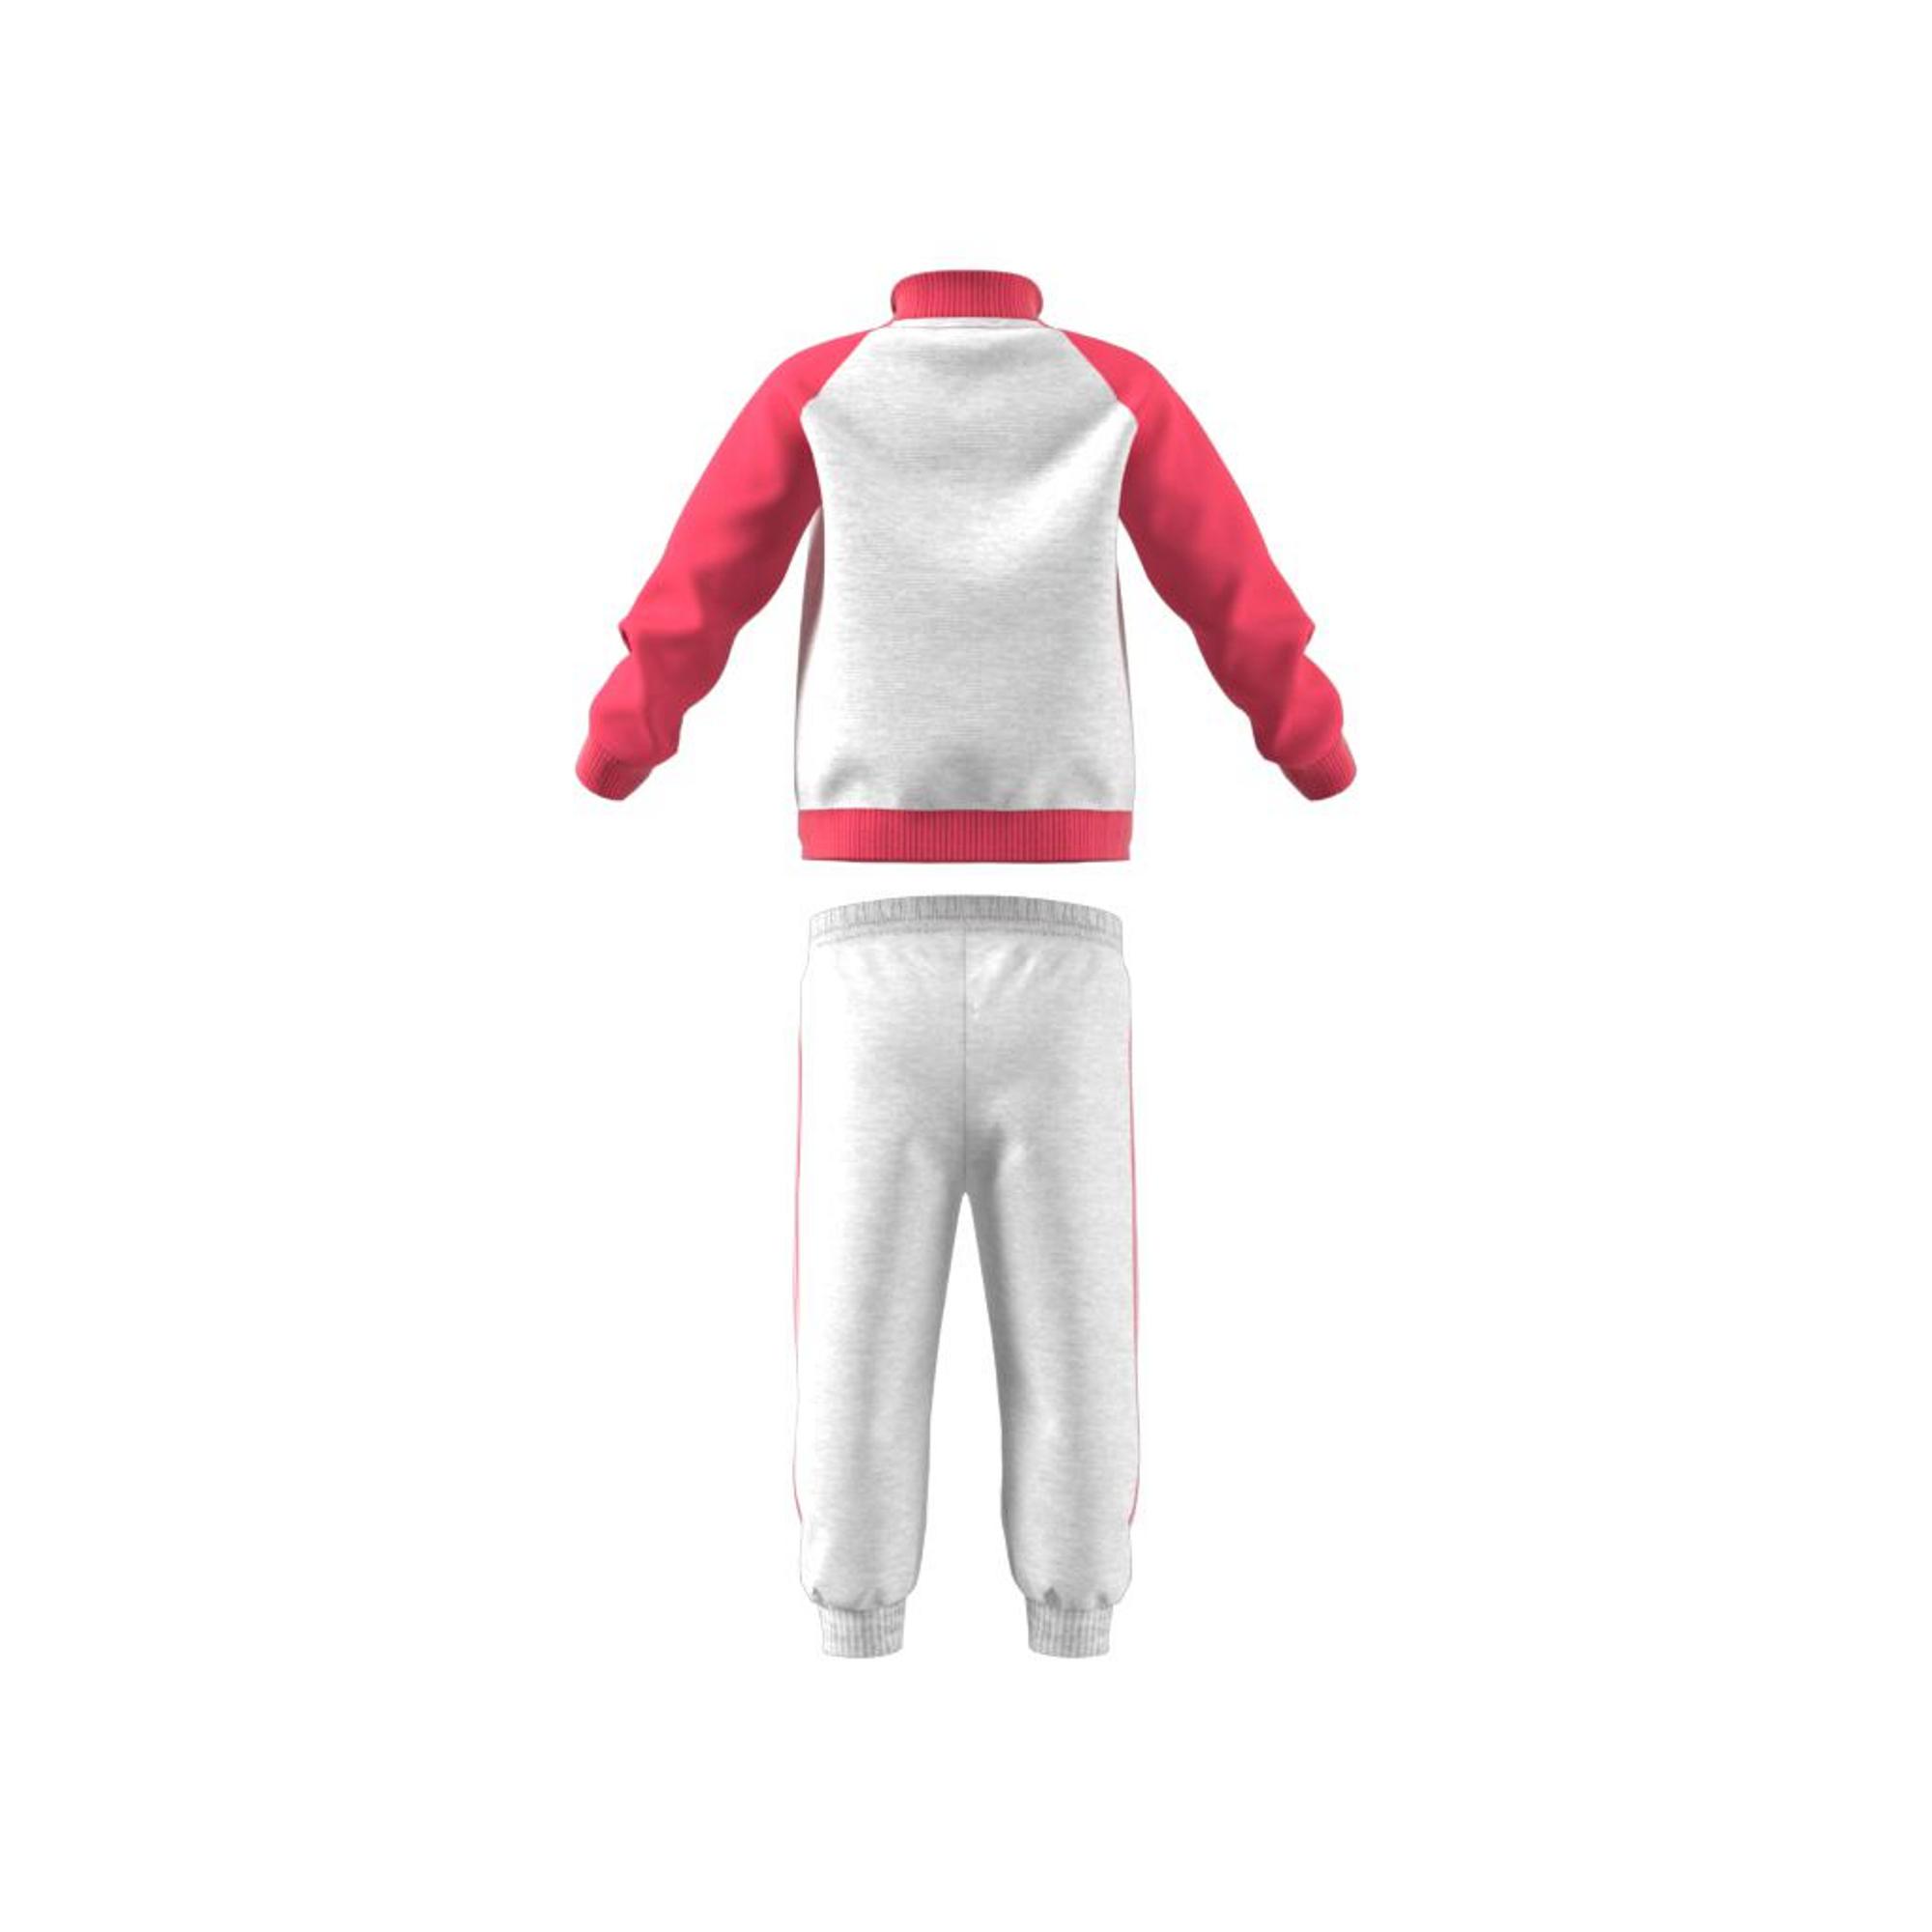 3e75e3eeb42 adidas - Βρεφικό σετ φόρμας adidas ροζ-γκρι, ΠΑΙΔΙ | ΡΟΥΧΑ | ΒΡΕΦΙΚΑ | ΣΕΤ